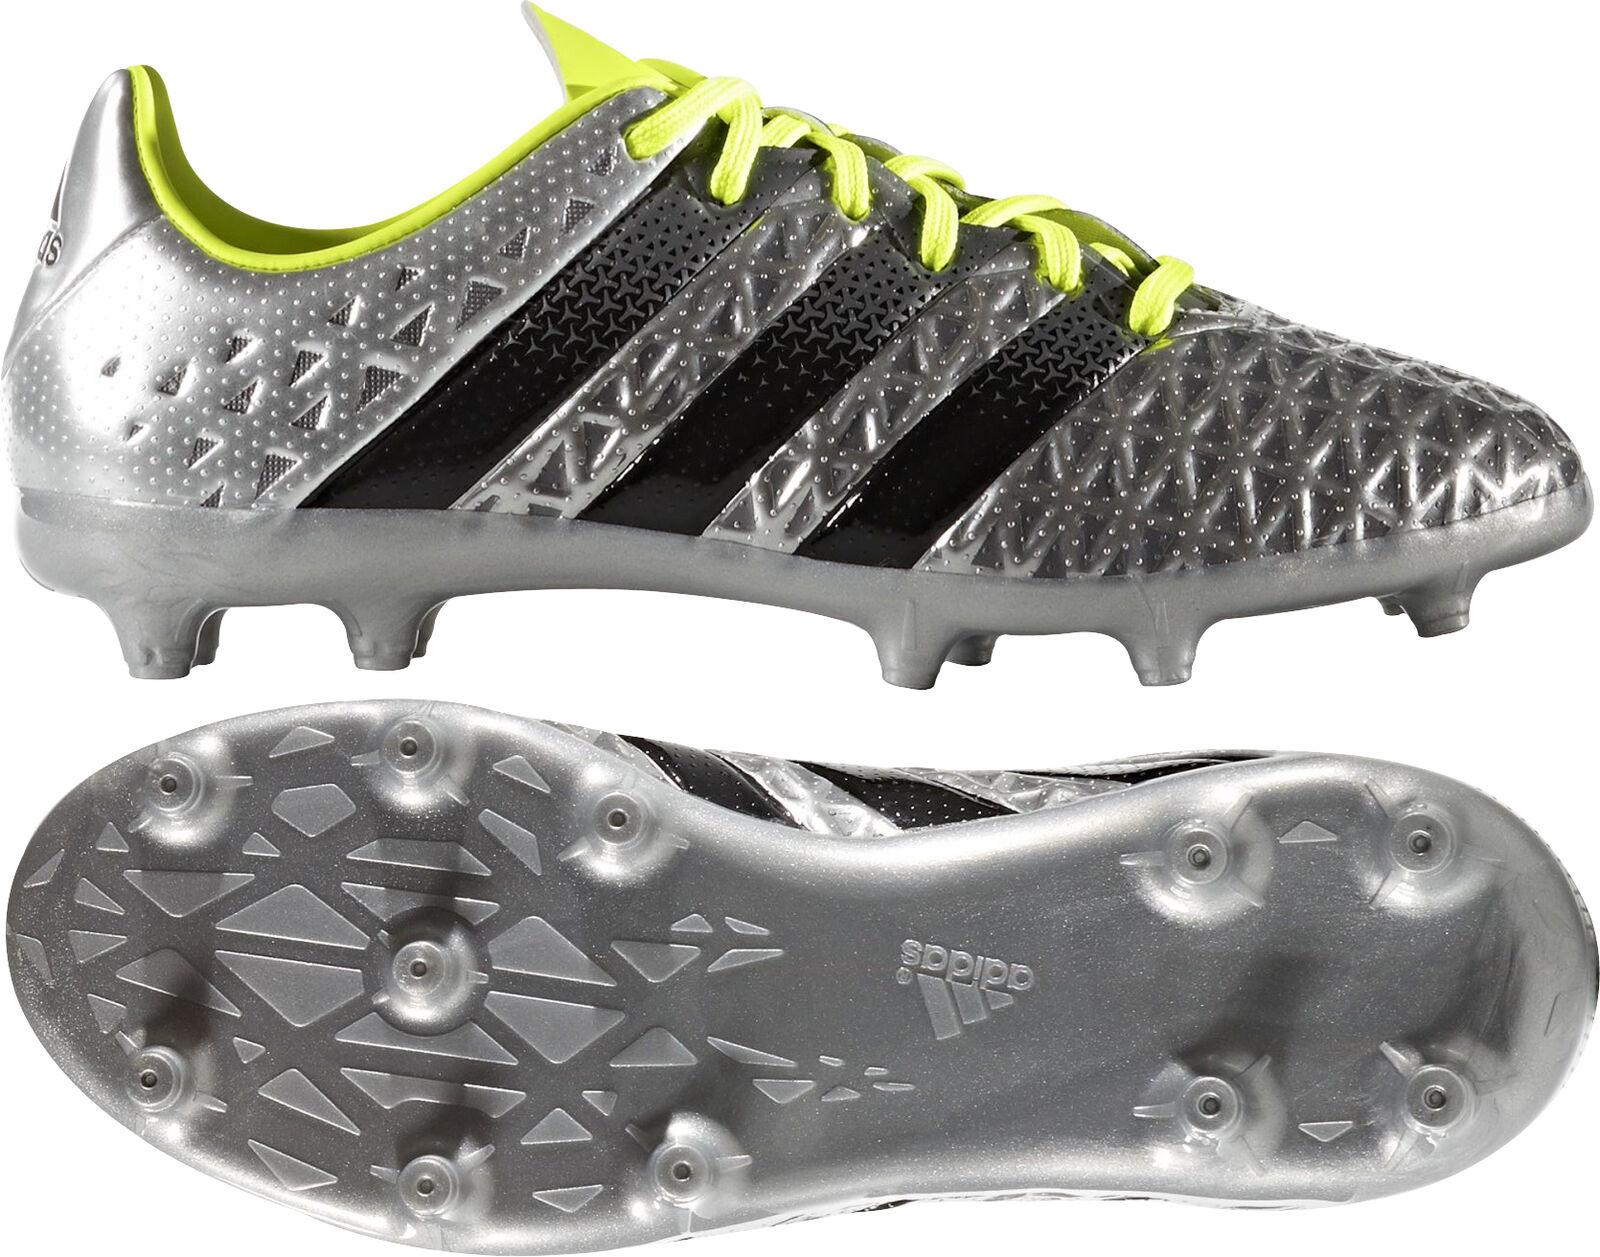 Adidas ACE 16.1 Terreno Firme botas De Fútbol Junior-Plata